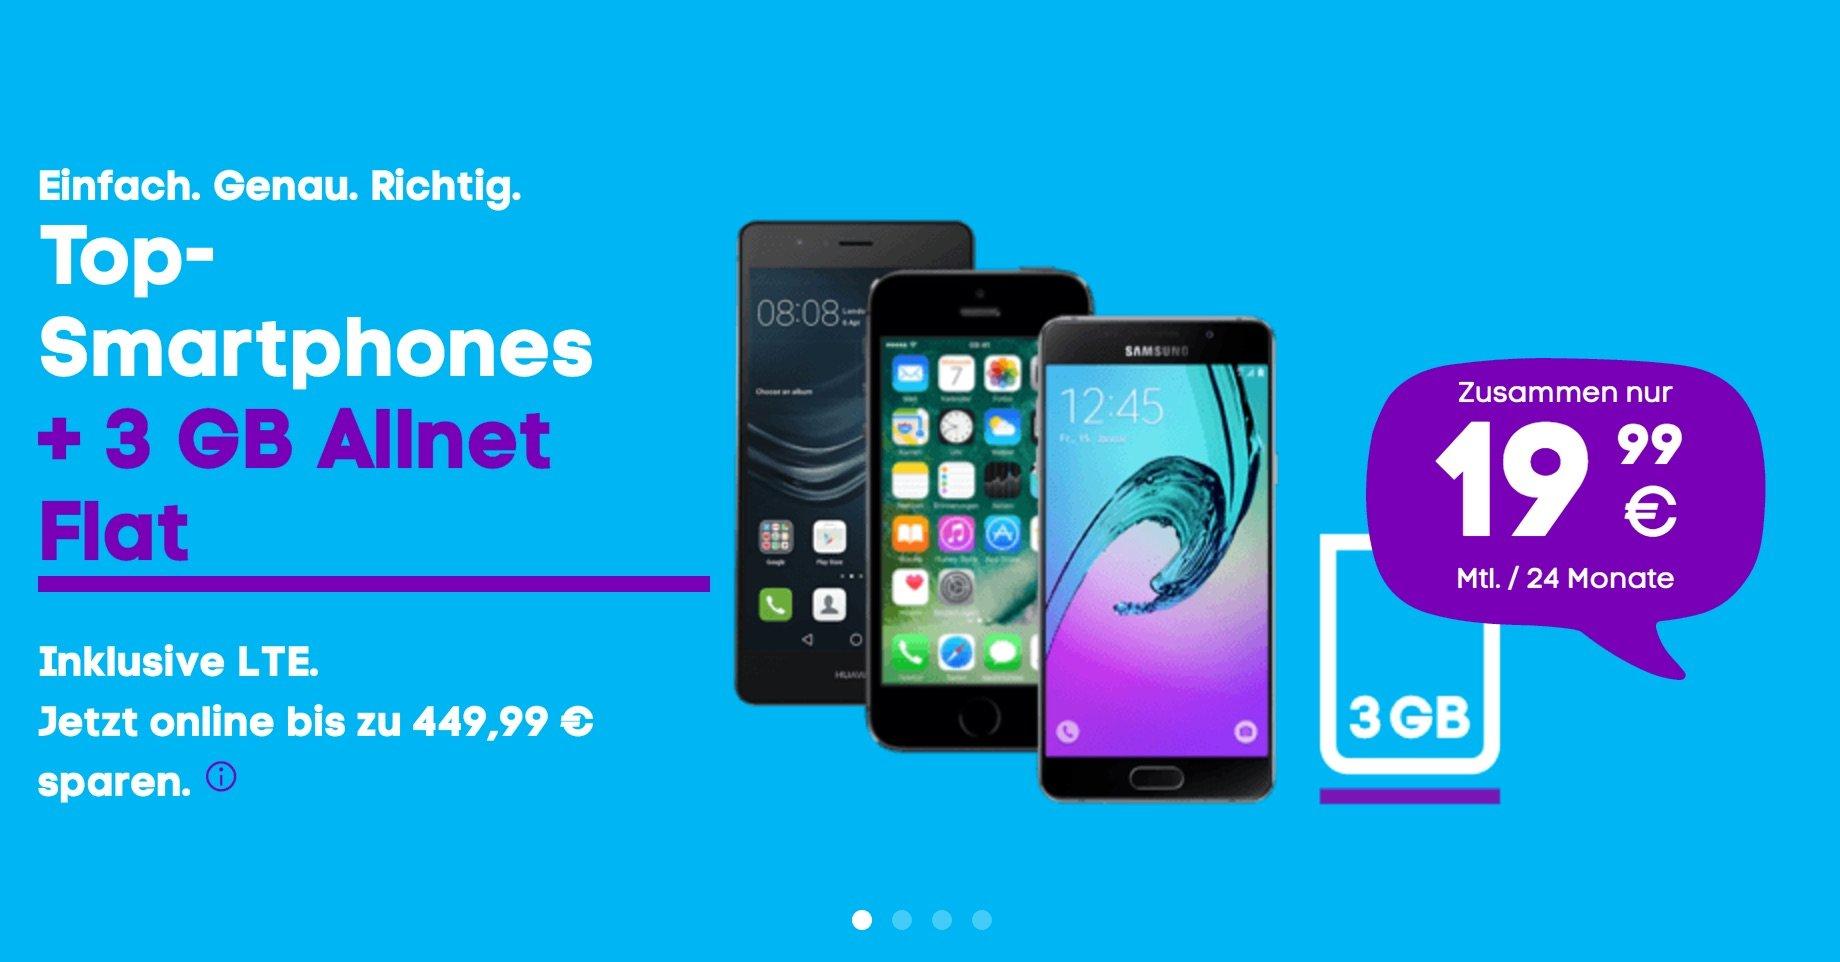 Neue Blau LTE Tarife: 3GB Allnet Flat für 14,99 Euro ohne Datenautomatik 21